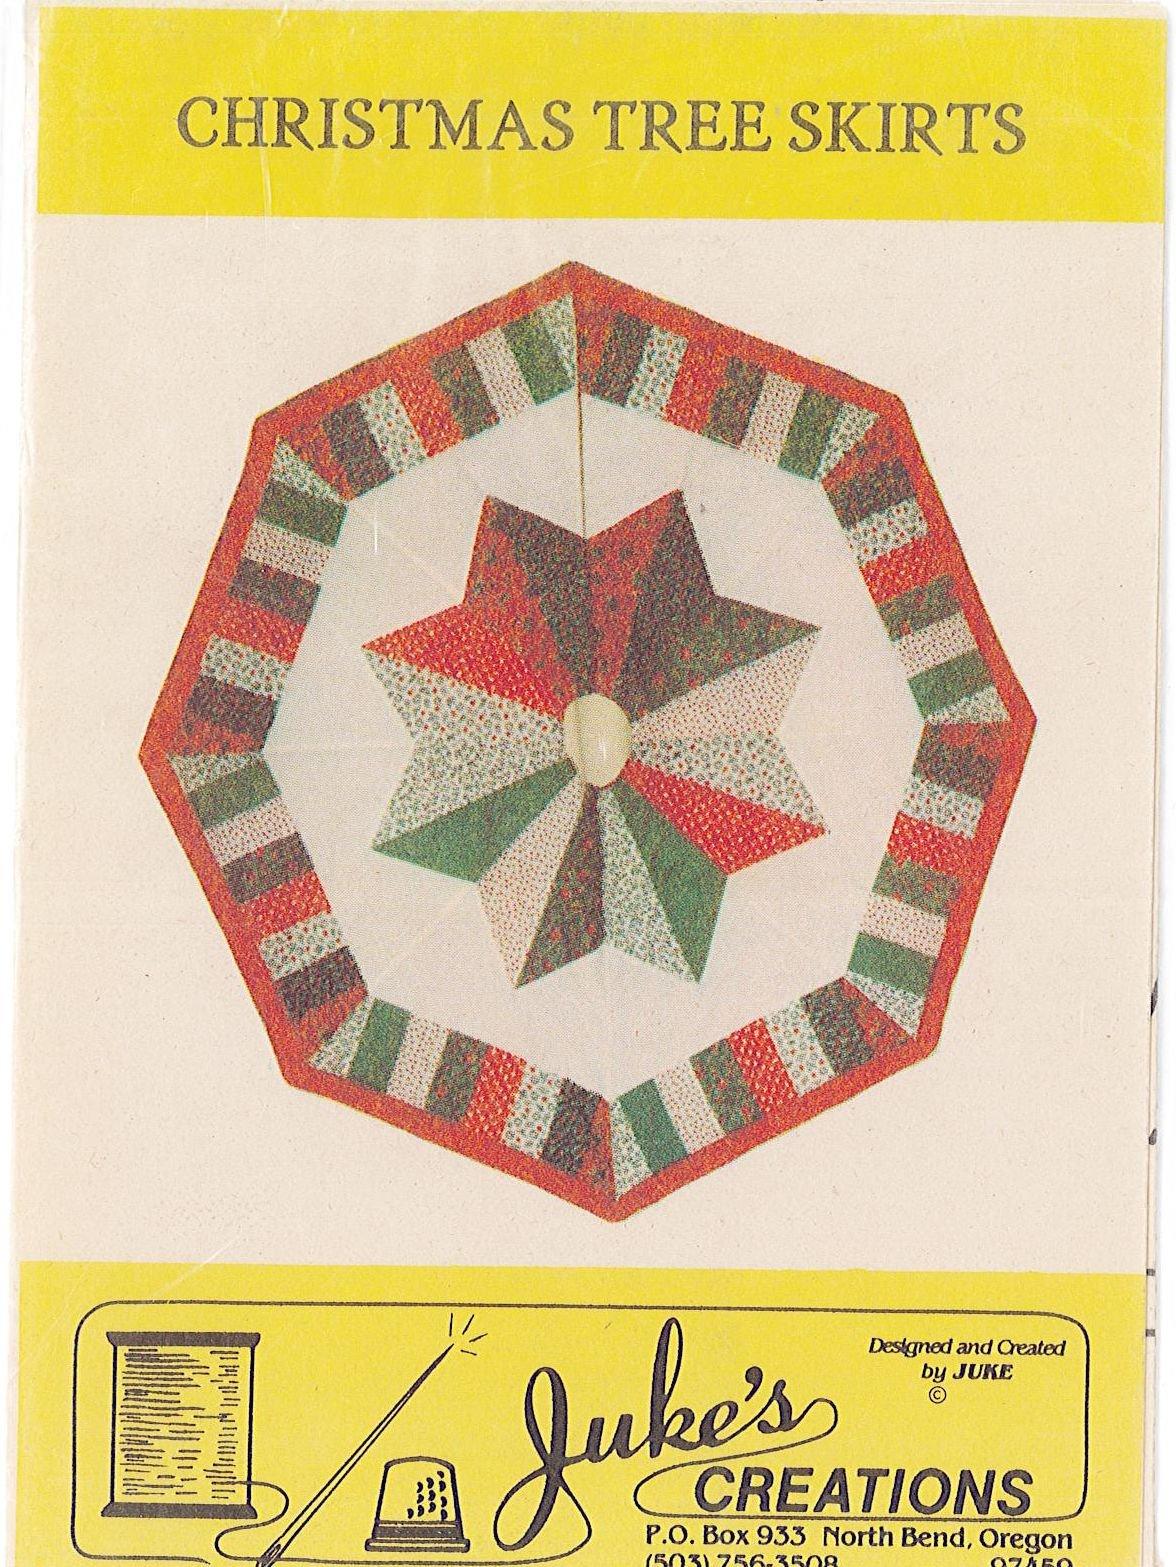 JUKE'S CREATIONS - Christmas Tree Skirts